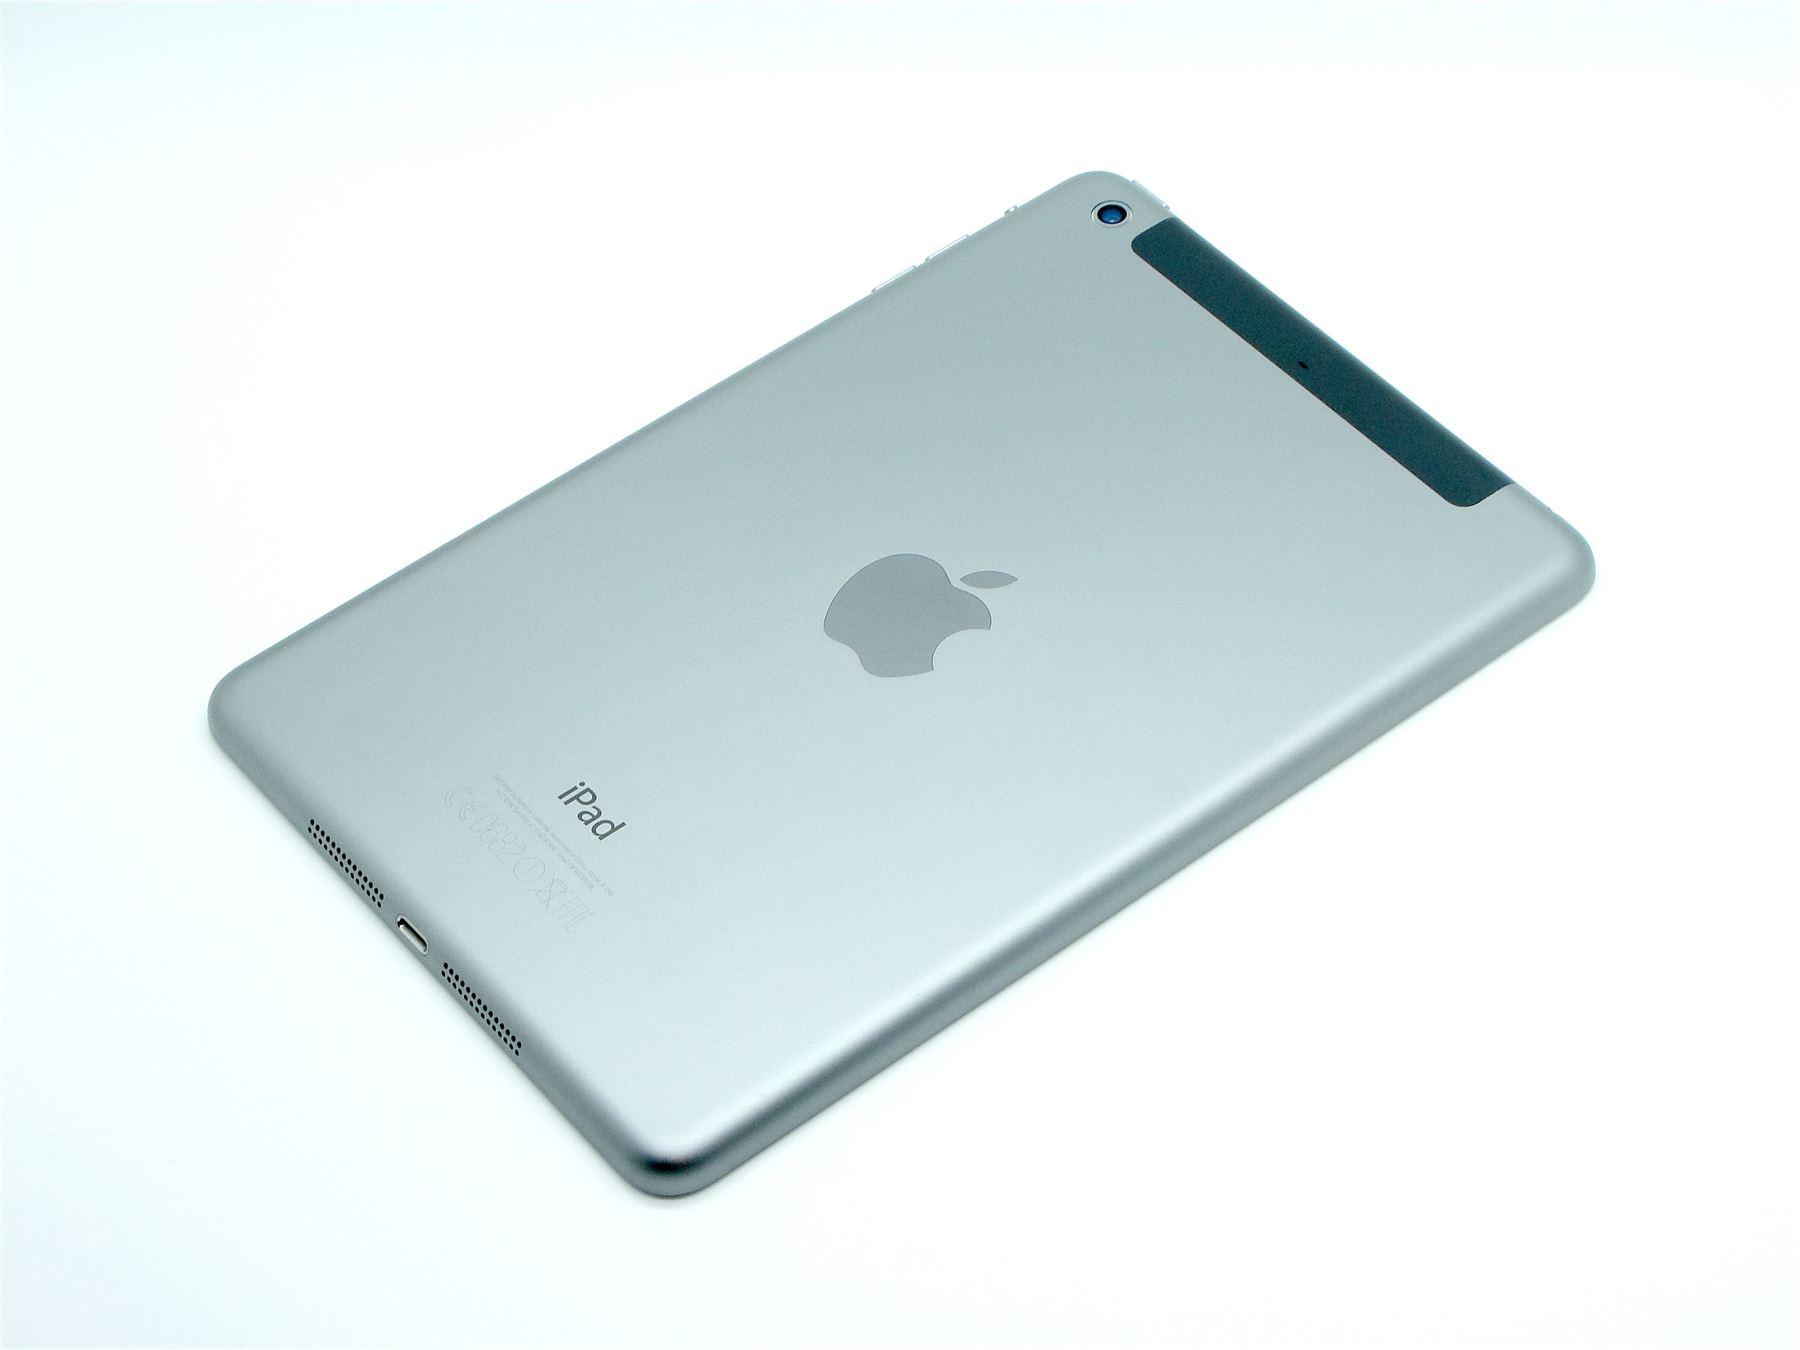 brand new apple ipad mini 2 32gb me280b a wifi 3g. Black Bedroom Furniture Sets. Home Design Ideas